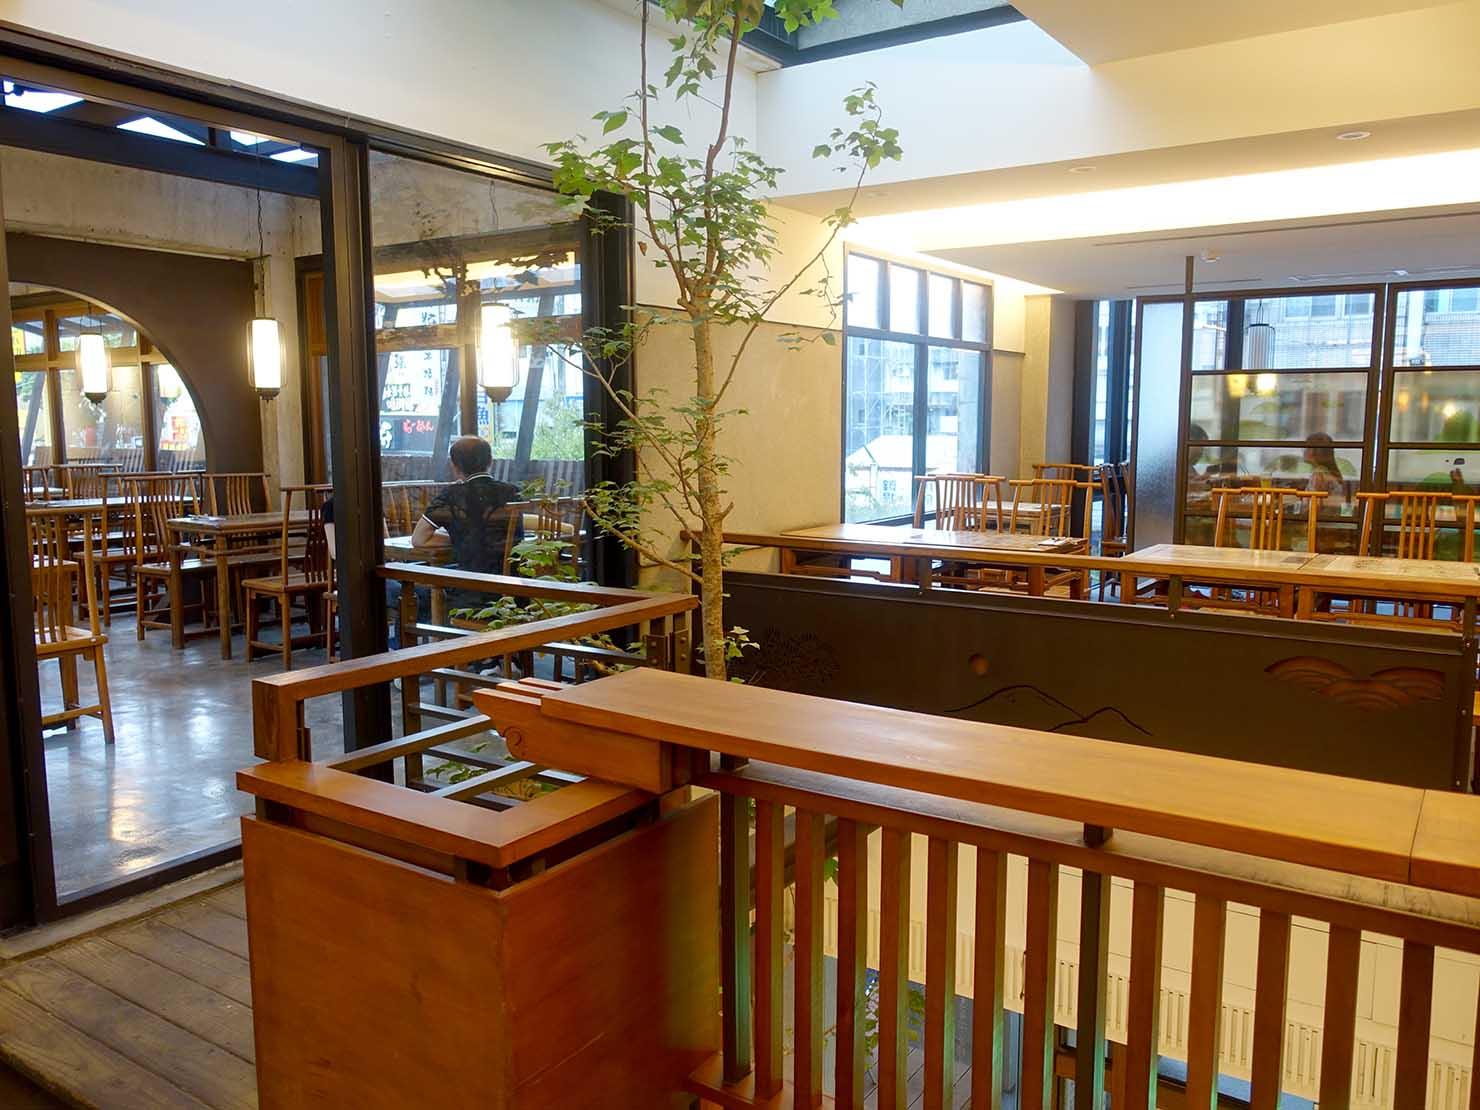 KKday外国人限定「花蓮・太魯閣(タロコ)日帰りツアー」夕食で立ち寄った王記茶舖の店内